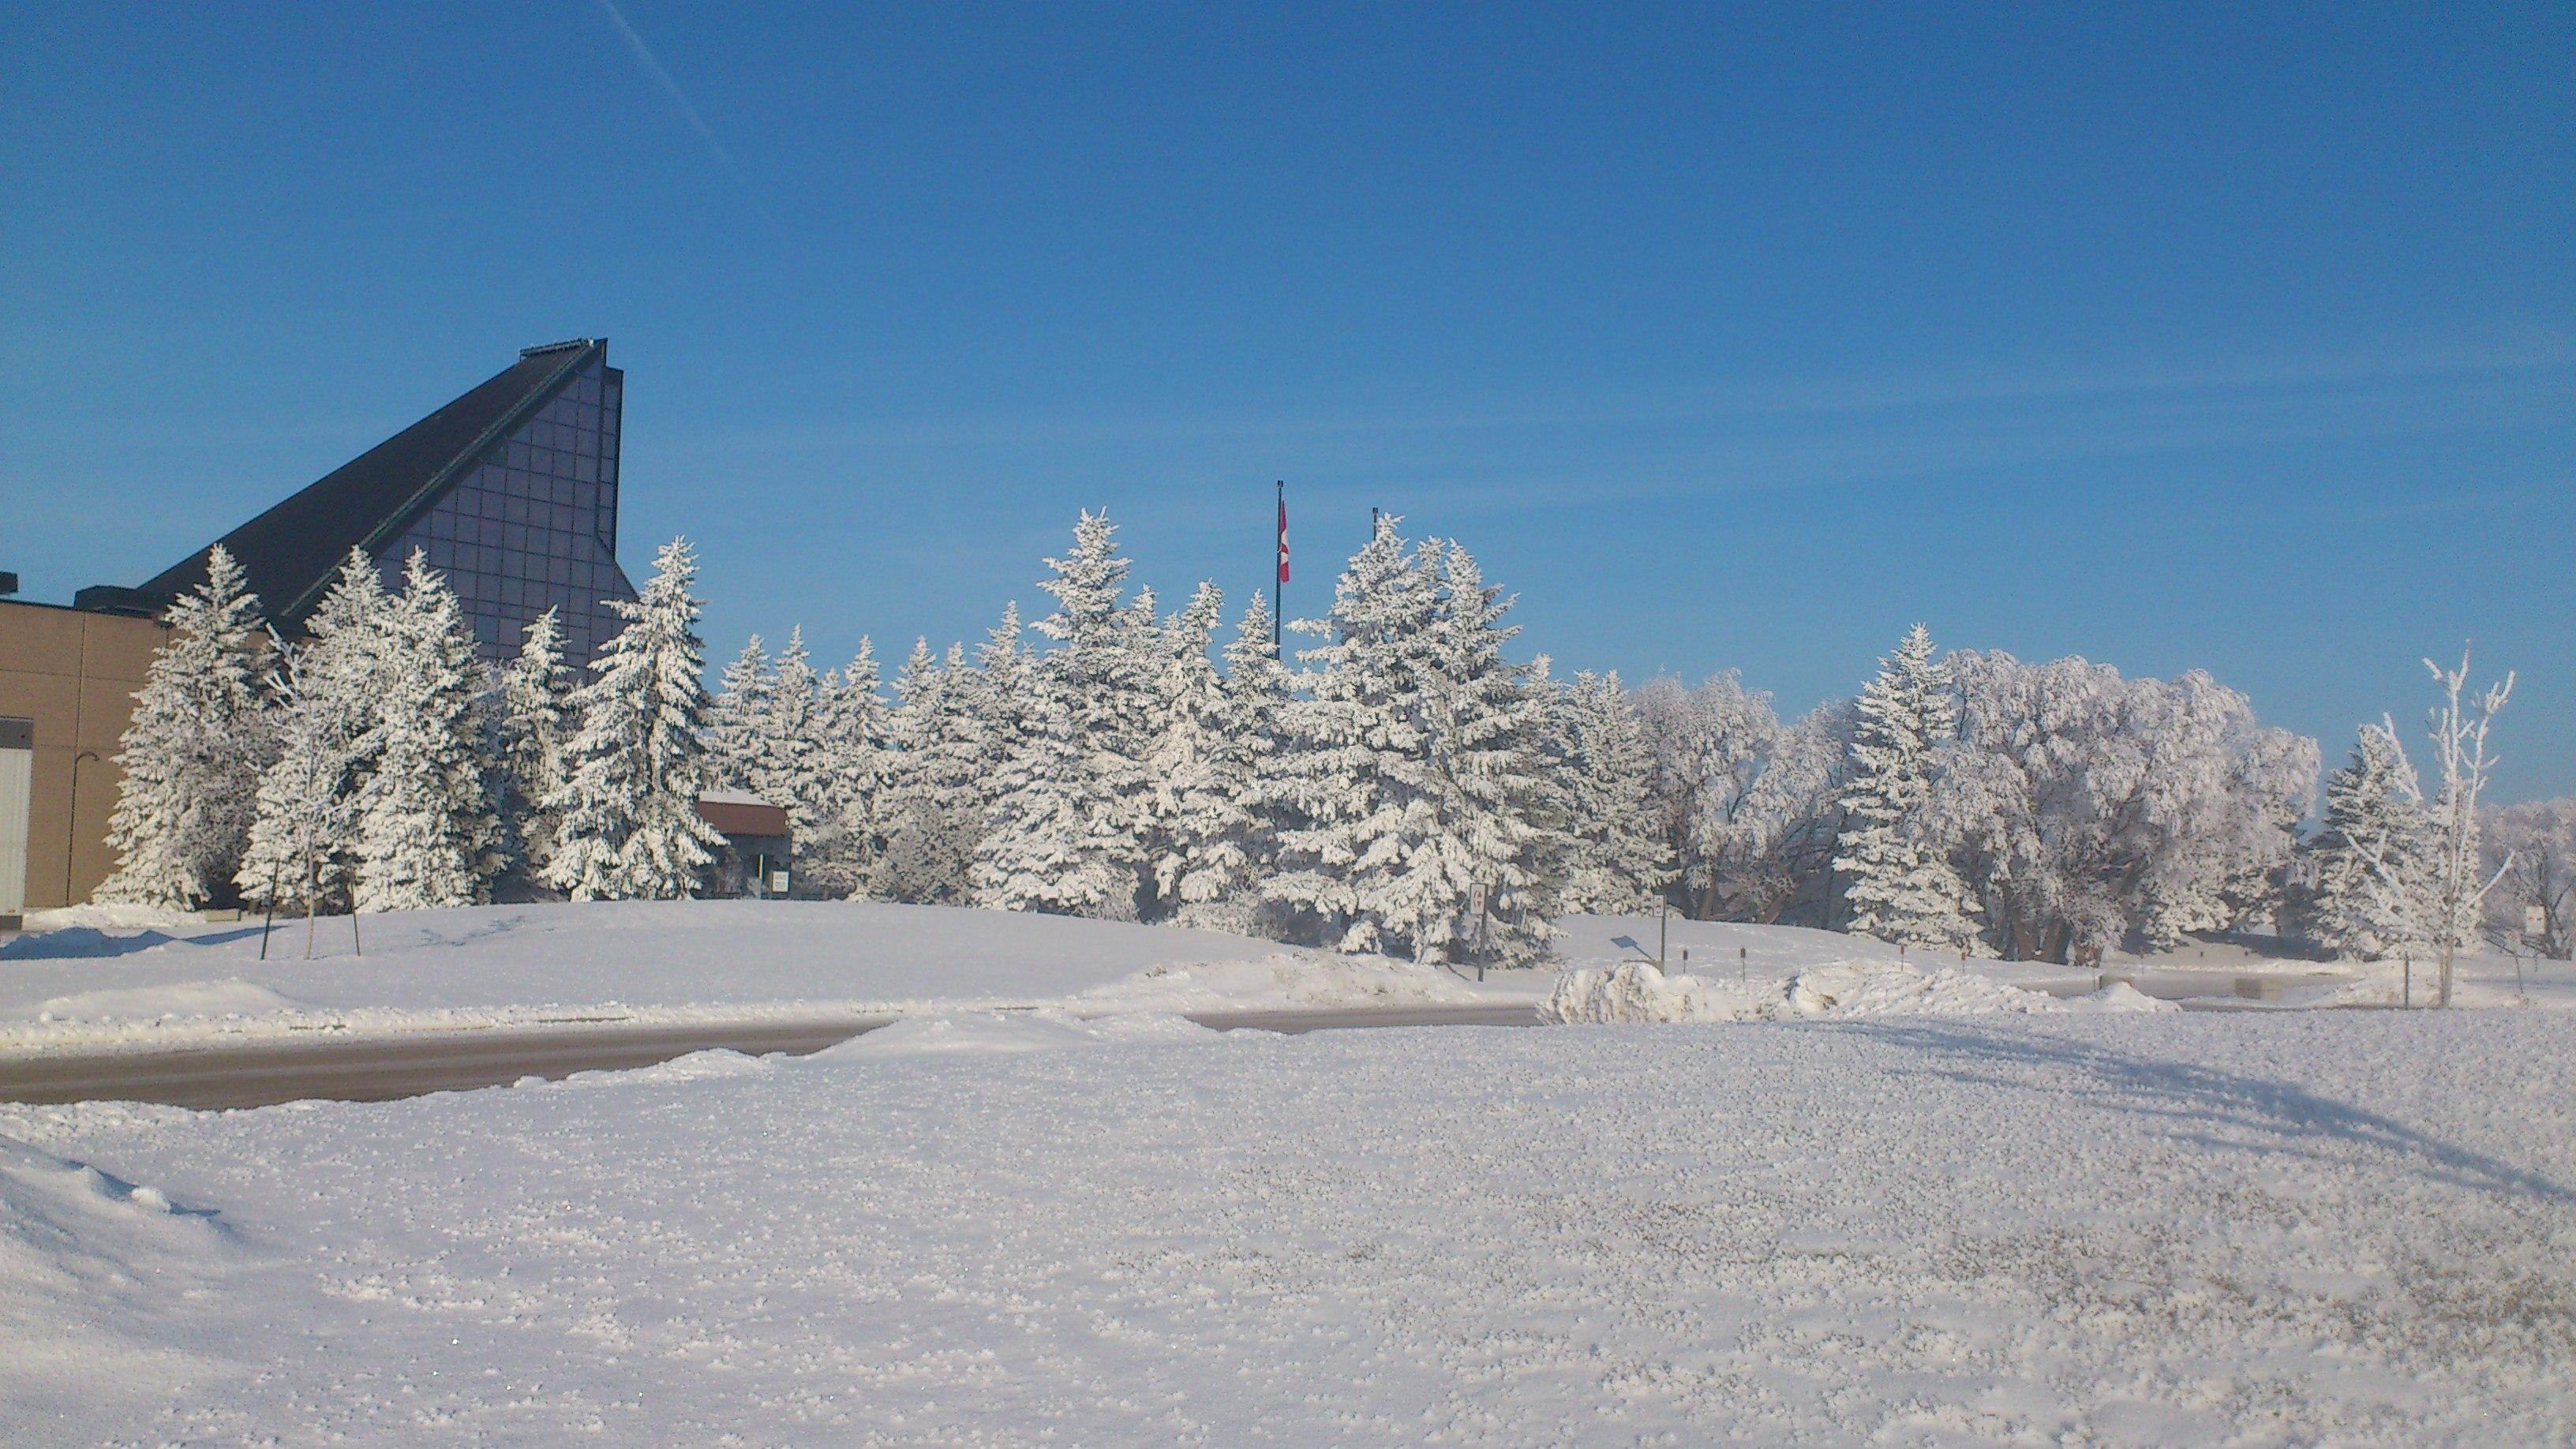 Winter Scenes | Exploring Winnipeg and Beyond.